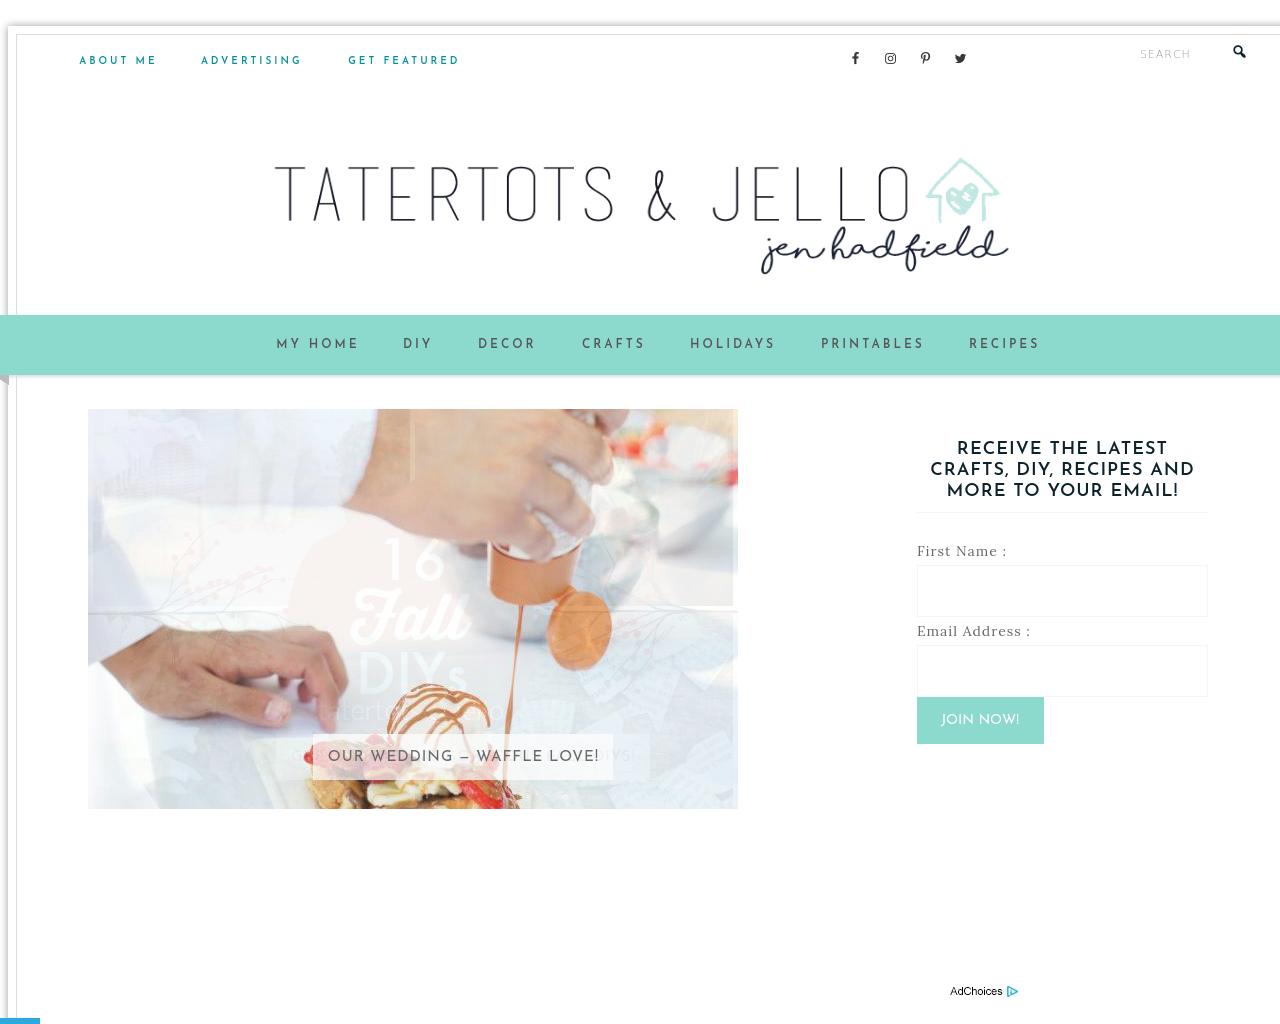 Tatertots-&-Jello-Advertising-Reviews-Pricing